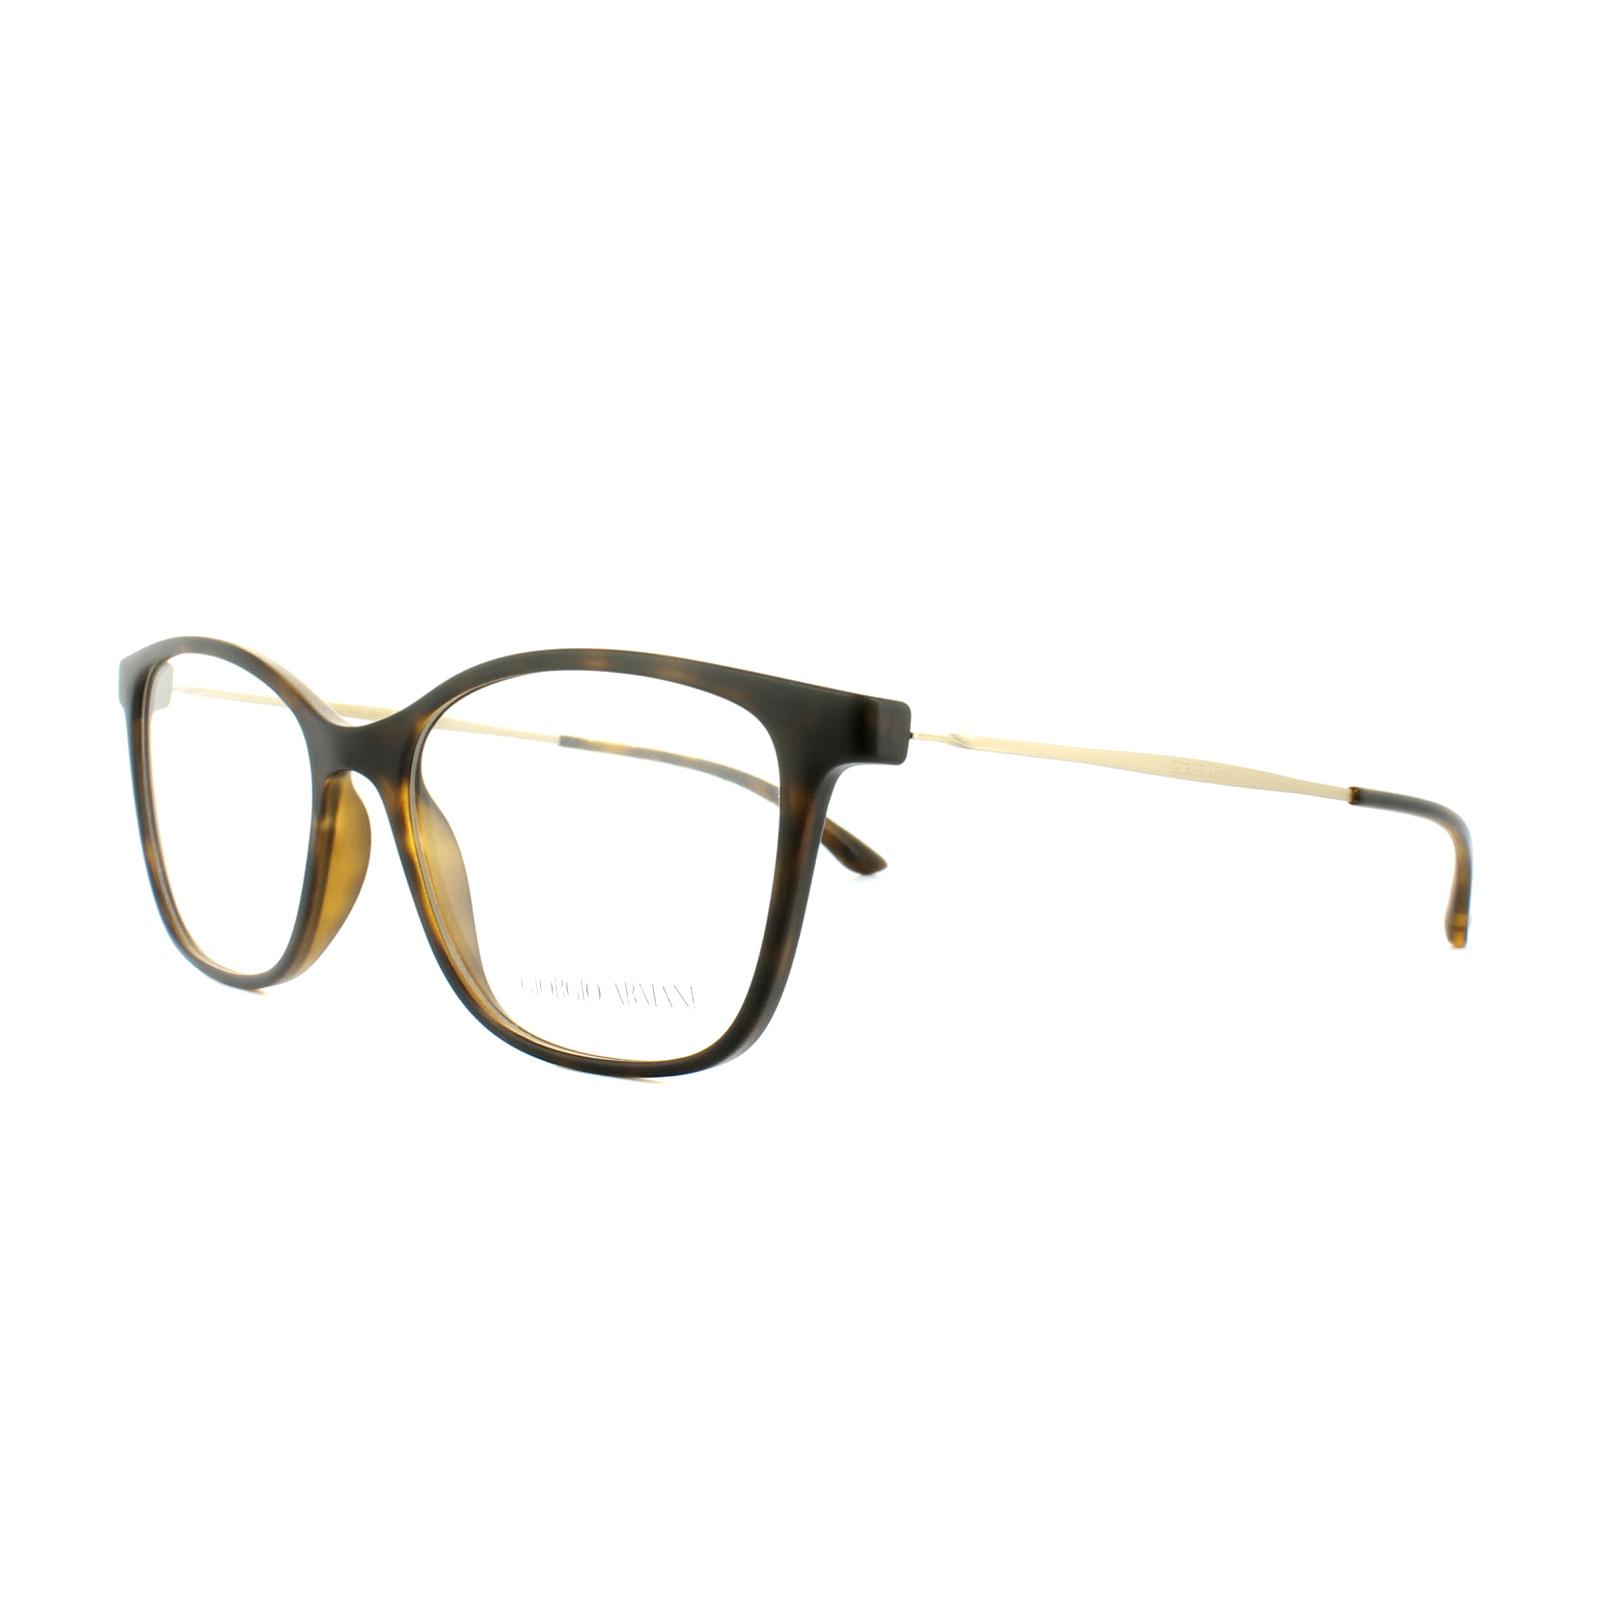 7c0af23057 Cheap Giorgio Armani AR 7094 Glasses Frames - Discounted Sunglasses